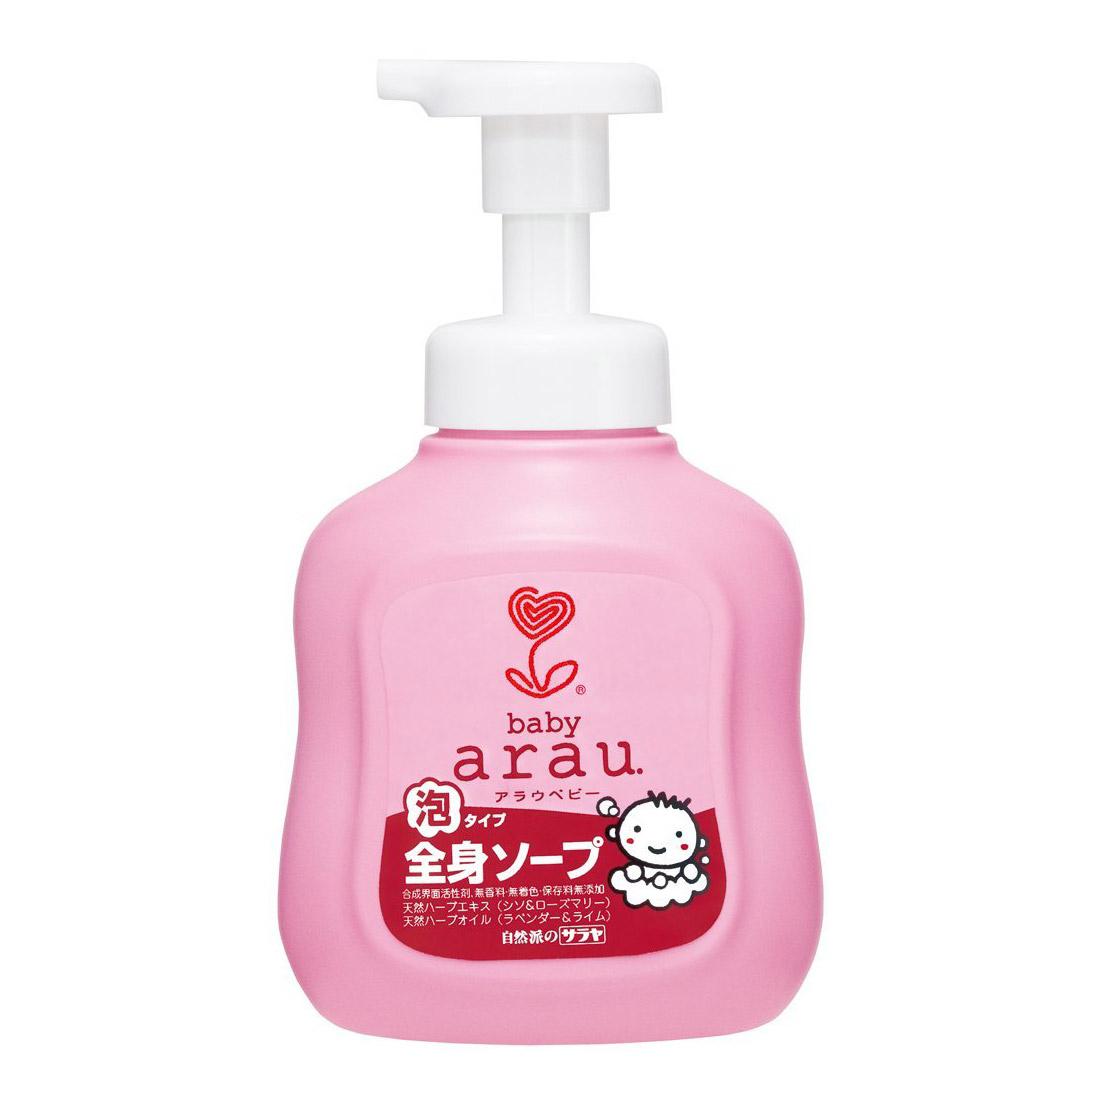 Sữa tắm trẻ em Arau baby 450ml